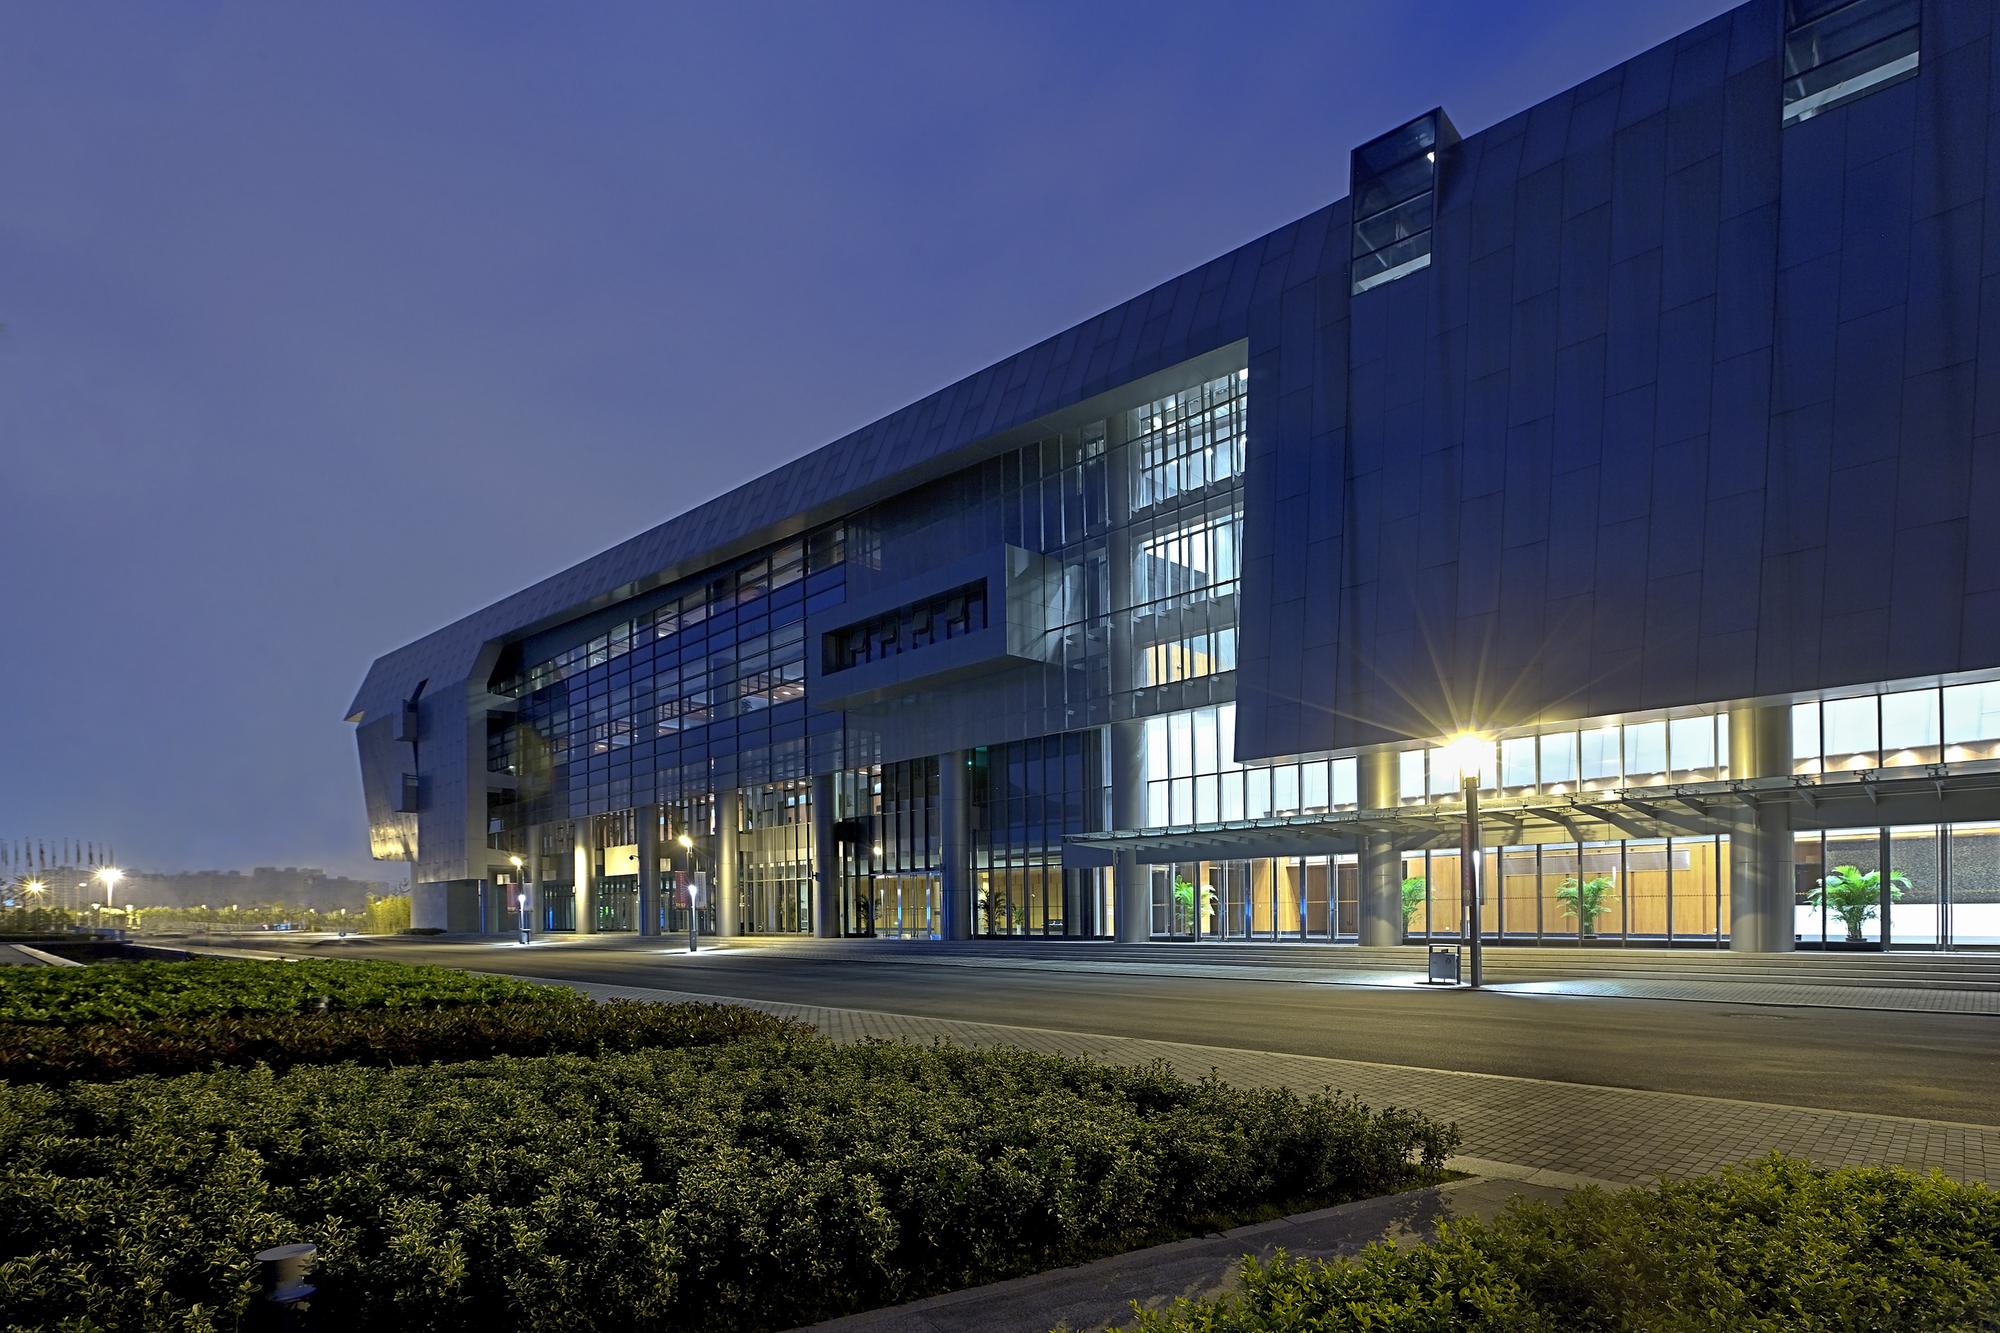 Nanjing Conference Center / tvsdesign, Courtesy of tvsdesign